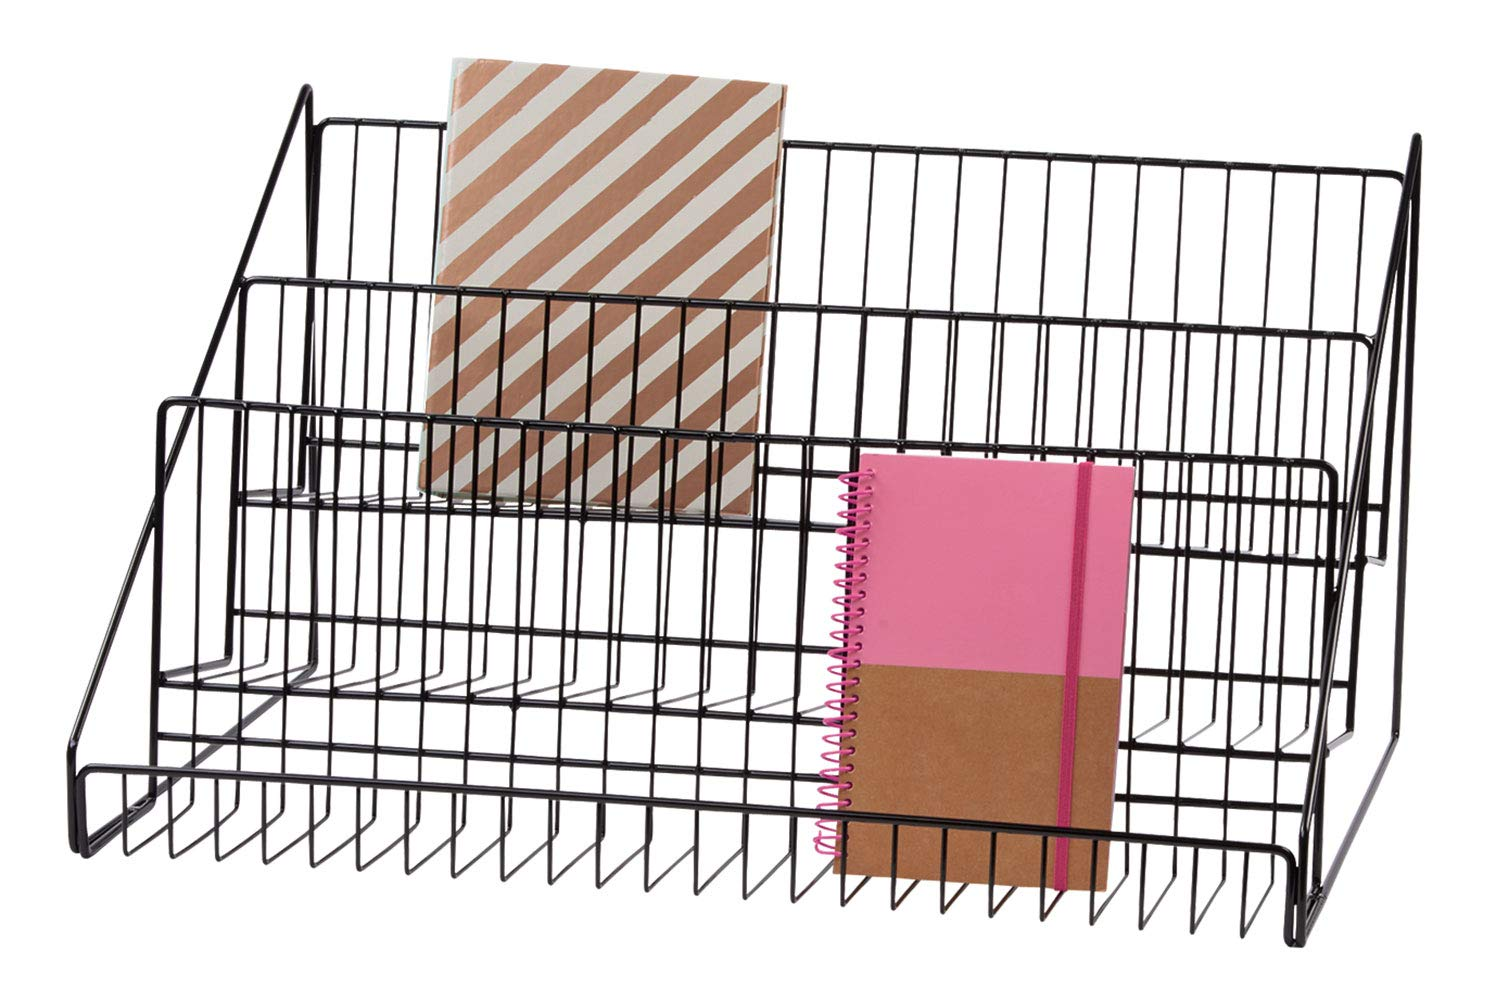 SSWBasics 3-Tier Black Wire Countertop Rack - 12¾''H x 23½''W x 14'' D by SSWBasics